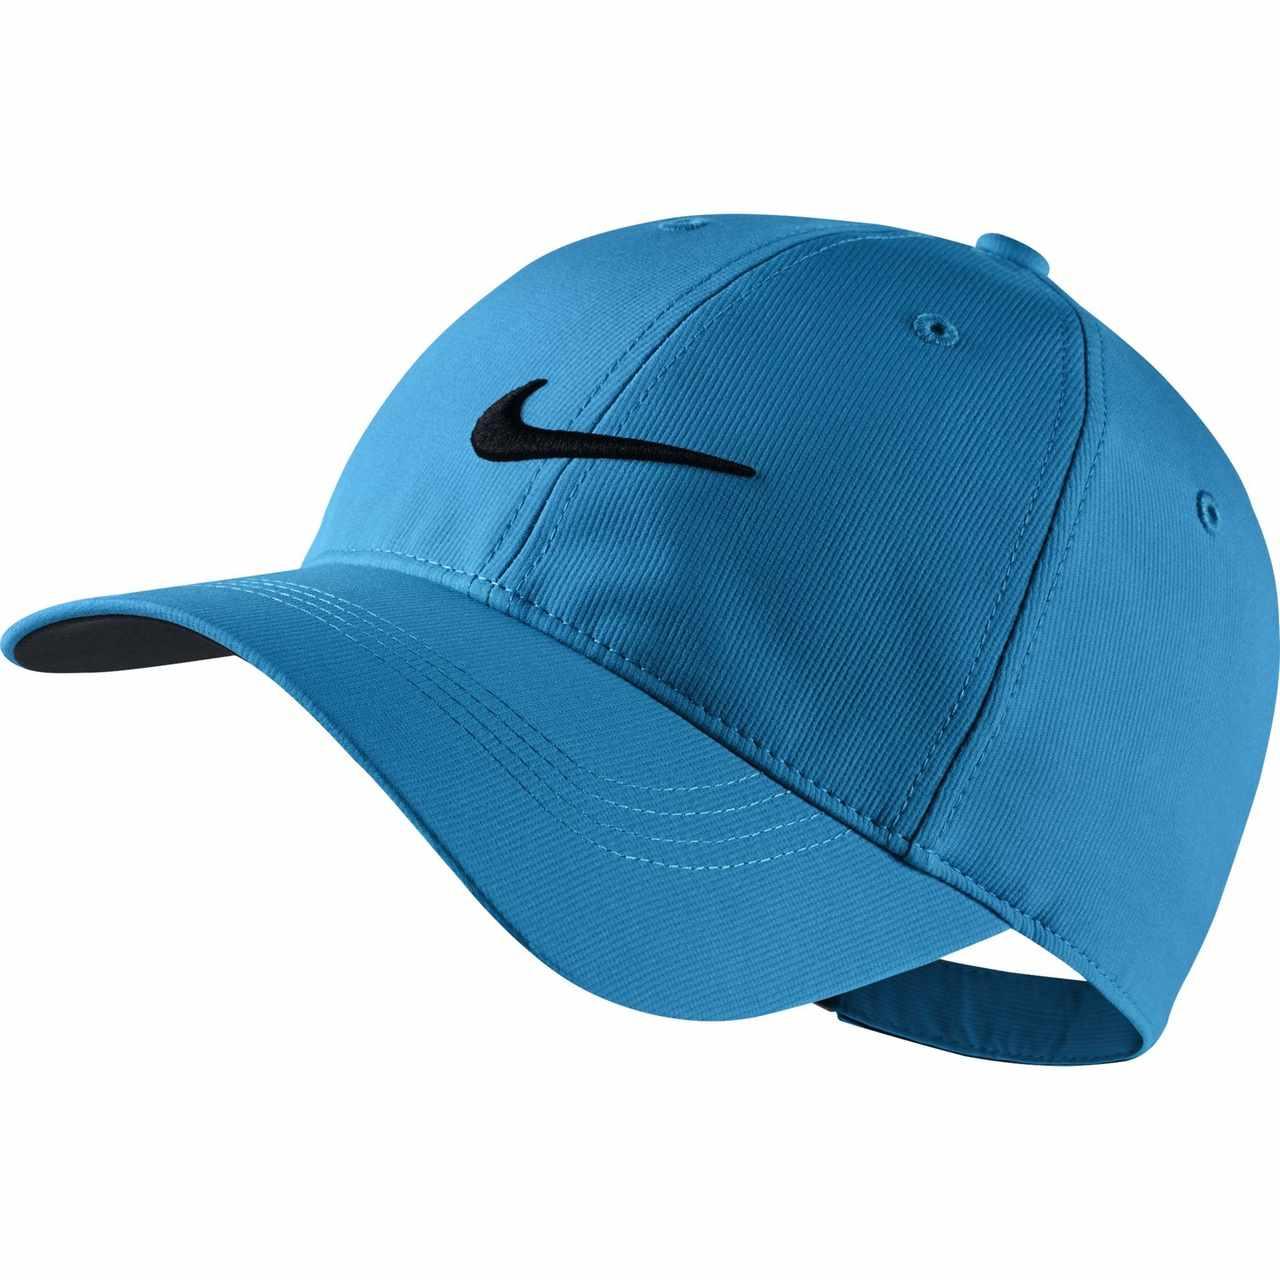 7798b16d9ba87 Nike Golf Legacy 91 Tech Adjustable Hat (Photo Blue Black) - Valor ...